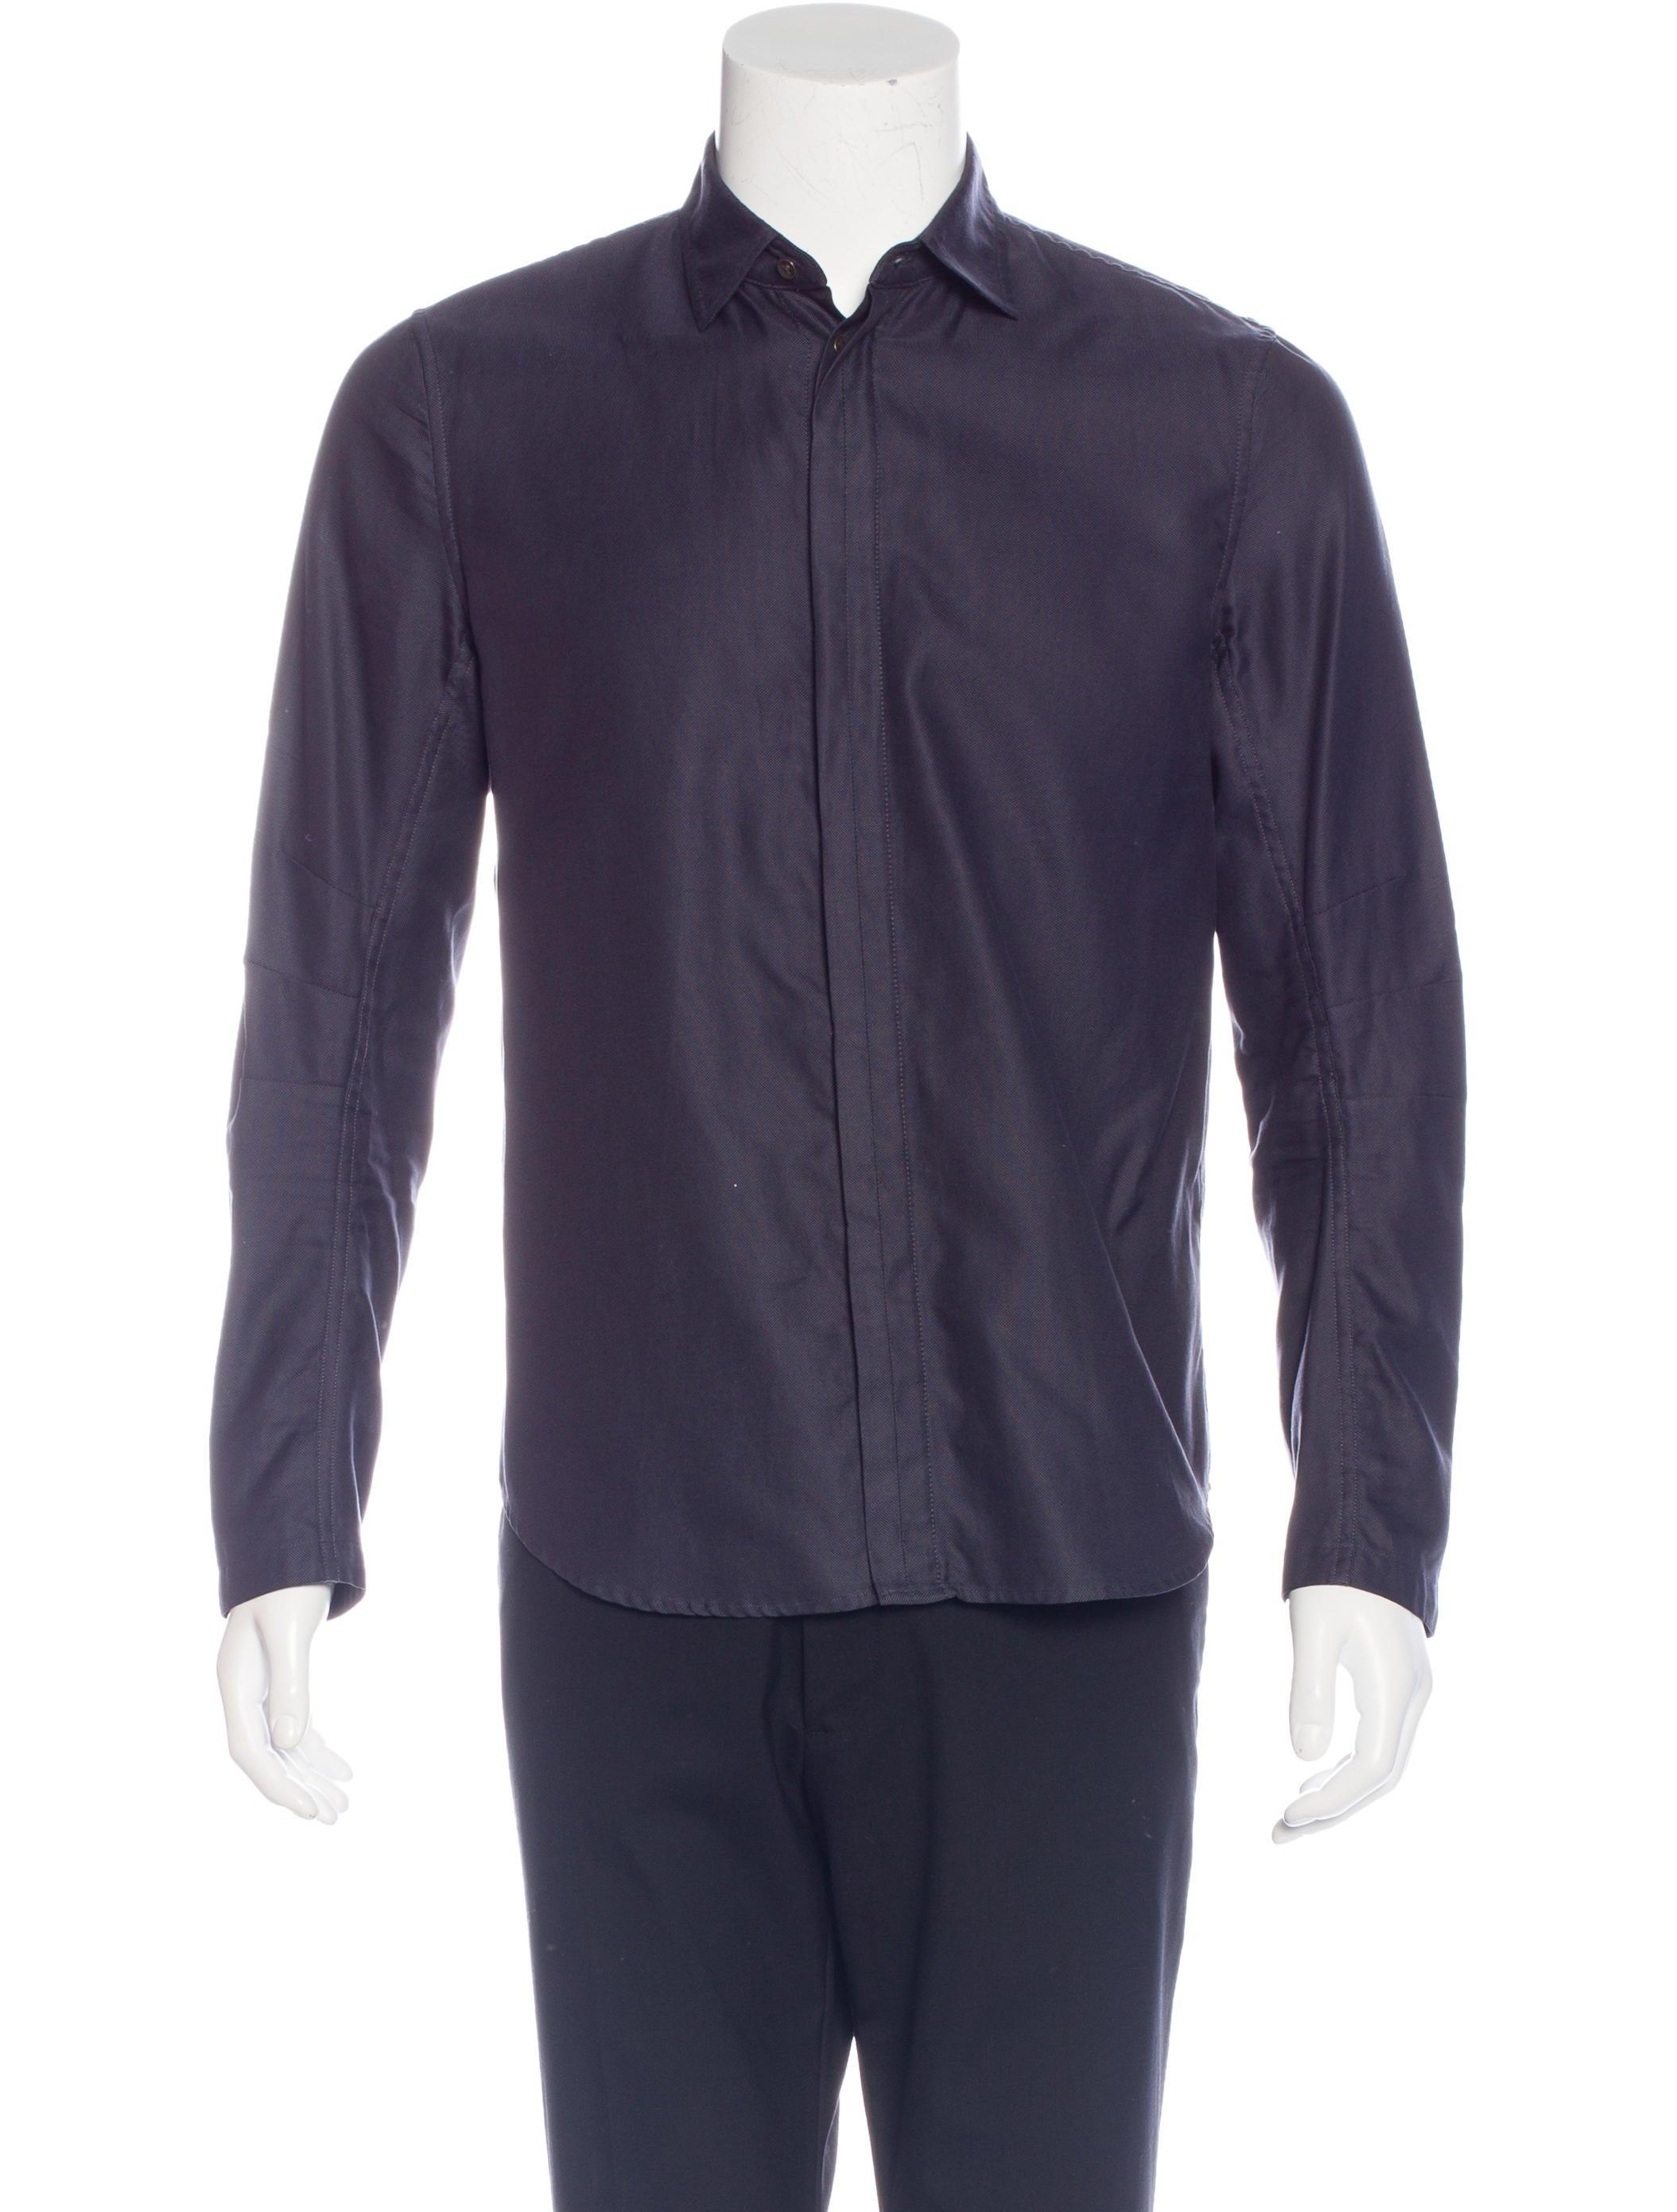 Rag Bone Woven Button Up Shirt Clothing Wragb73935